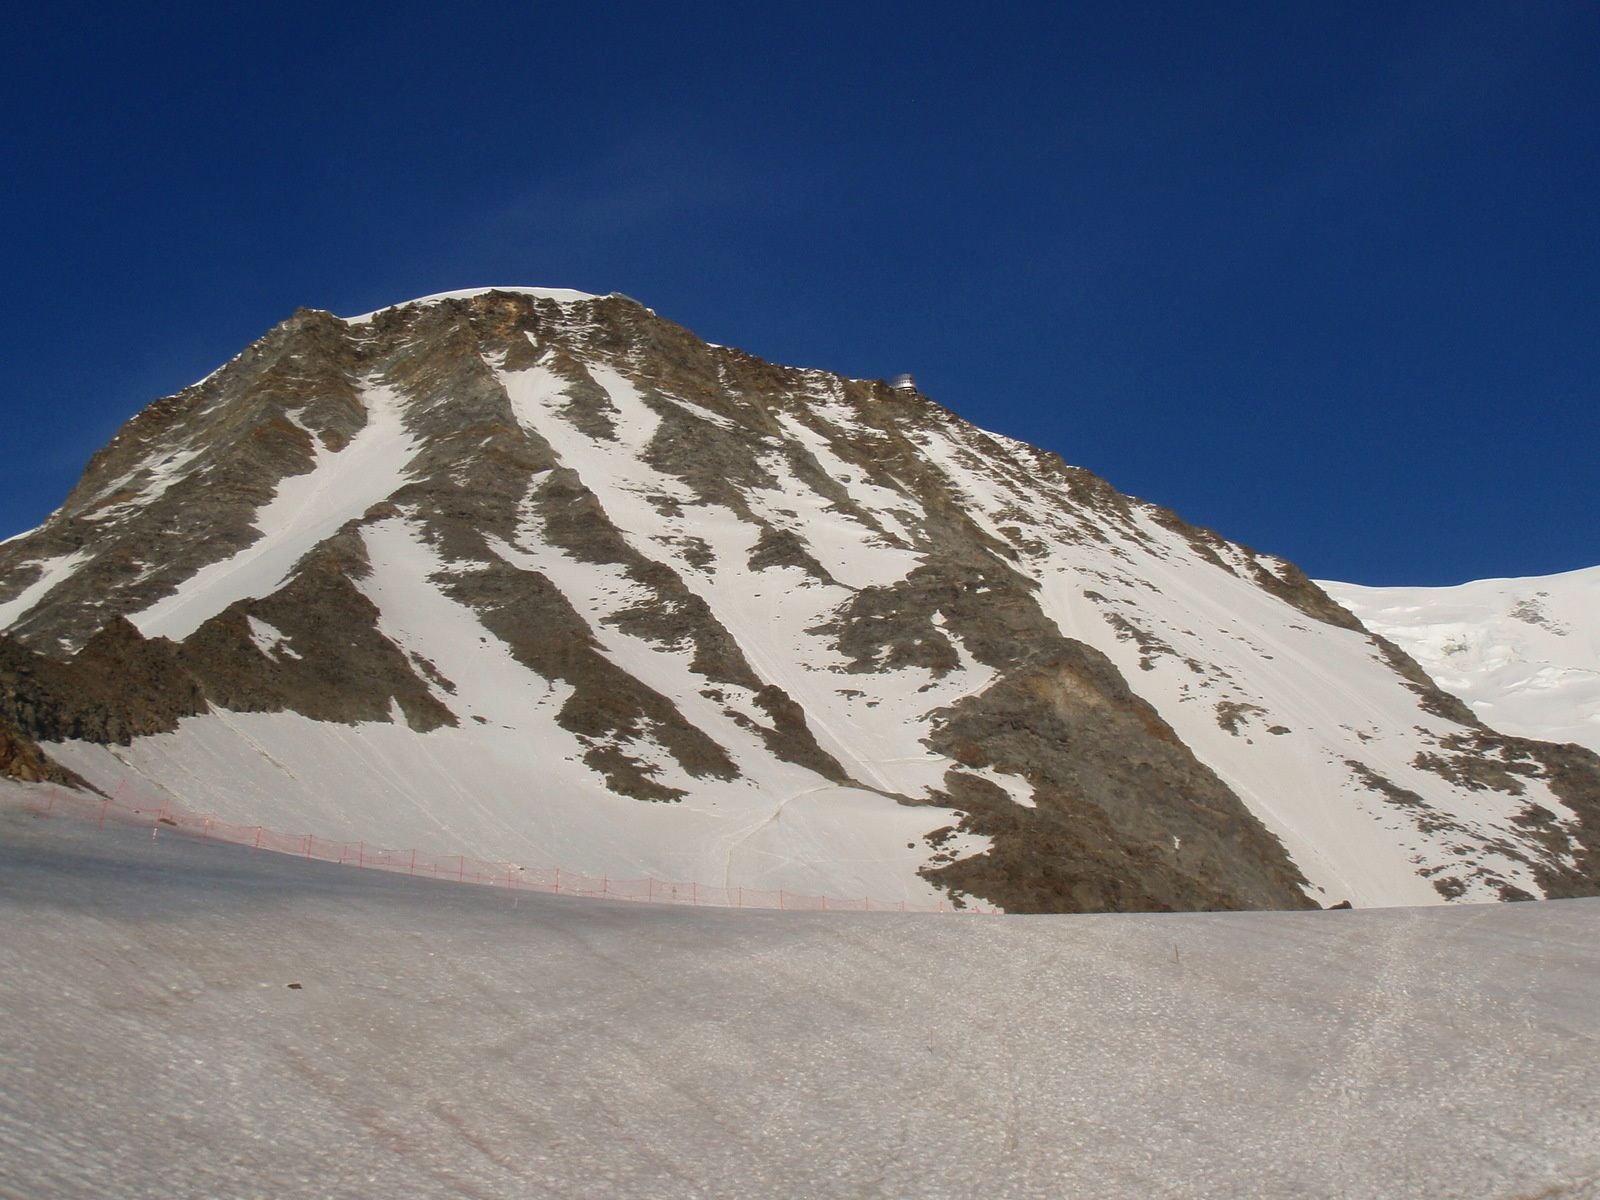 Mont-Blanc: Traversée 3 Monts&gt&#x3B;&gt&#x3B;&gt&#x3B;Goûter (2/2)